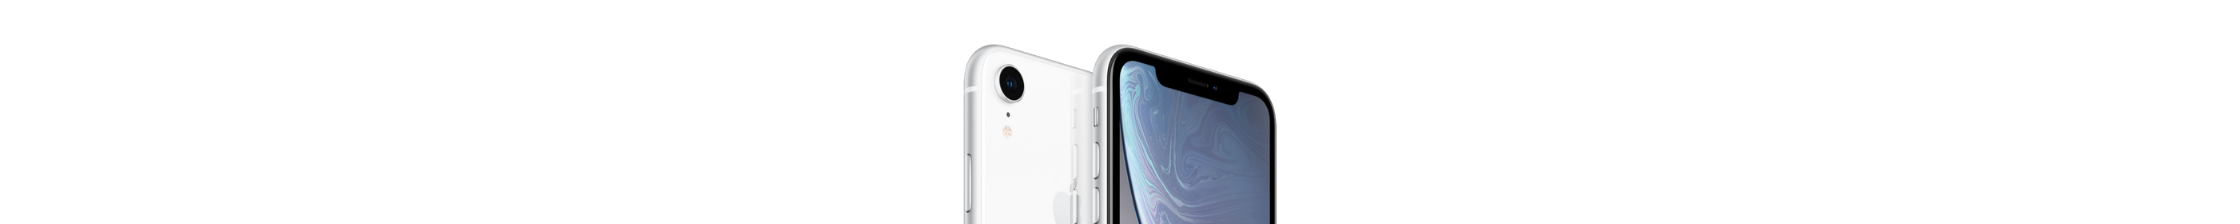 test-iphone-xr